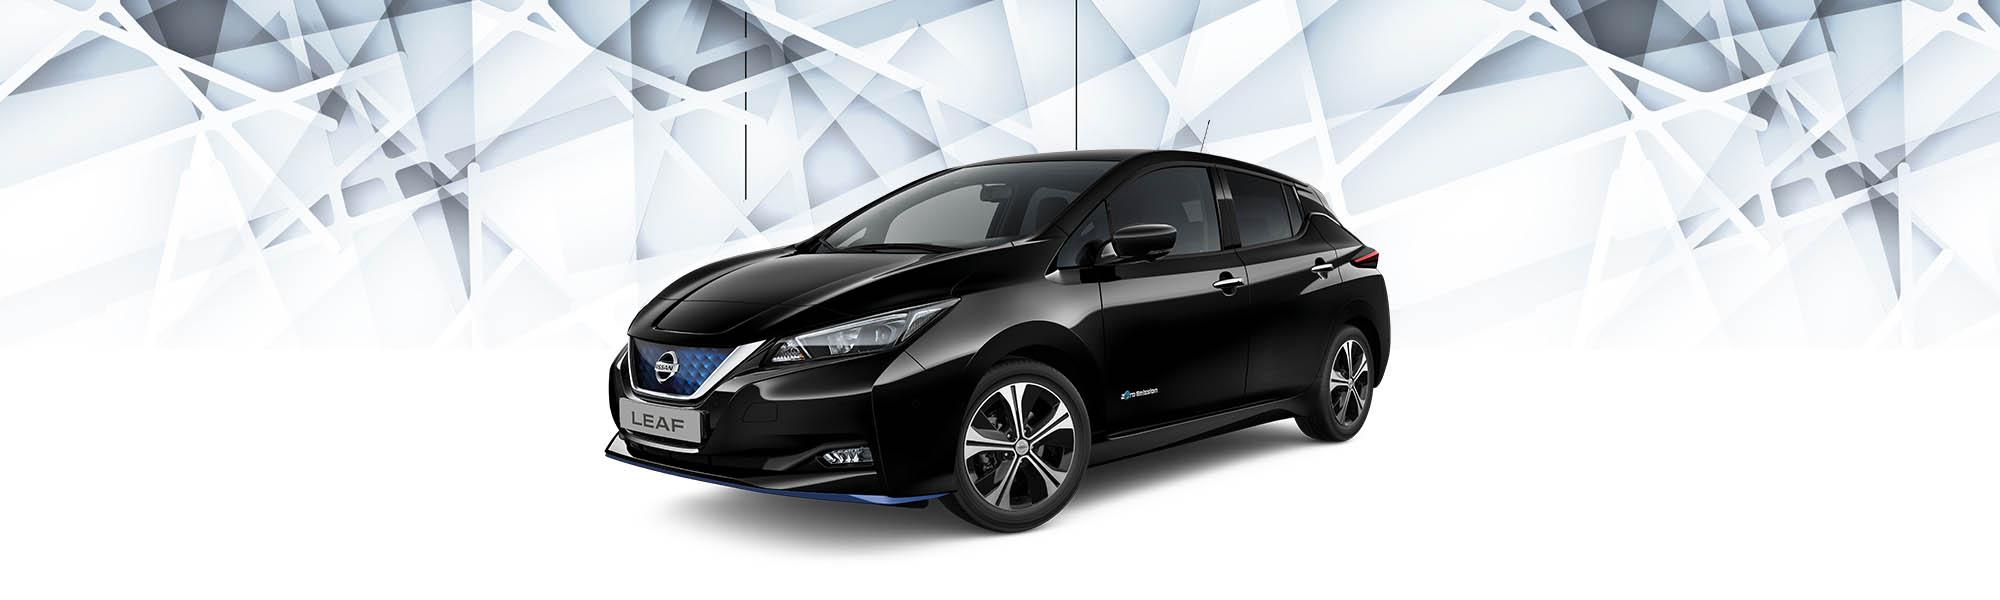 Nissan Leaf Business Edition